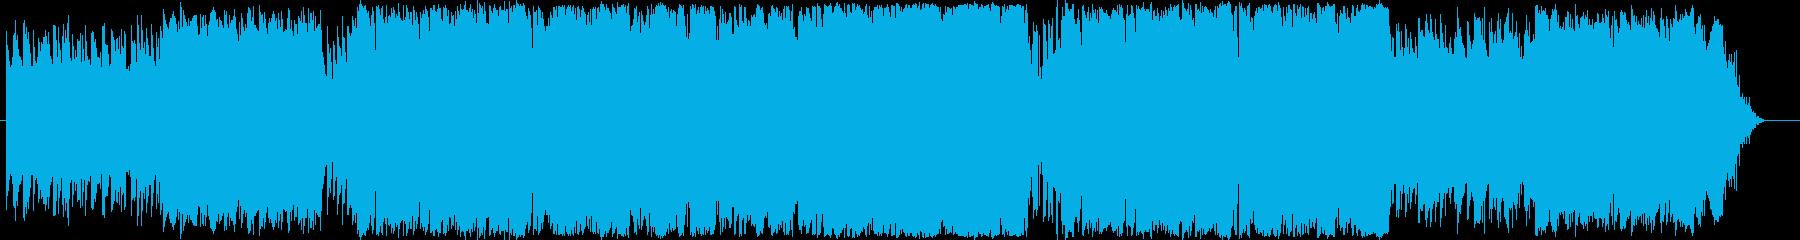 STG等のBGM用テクノの再生済みの波形